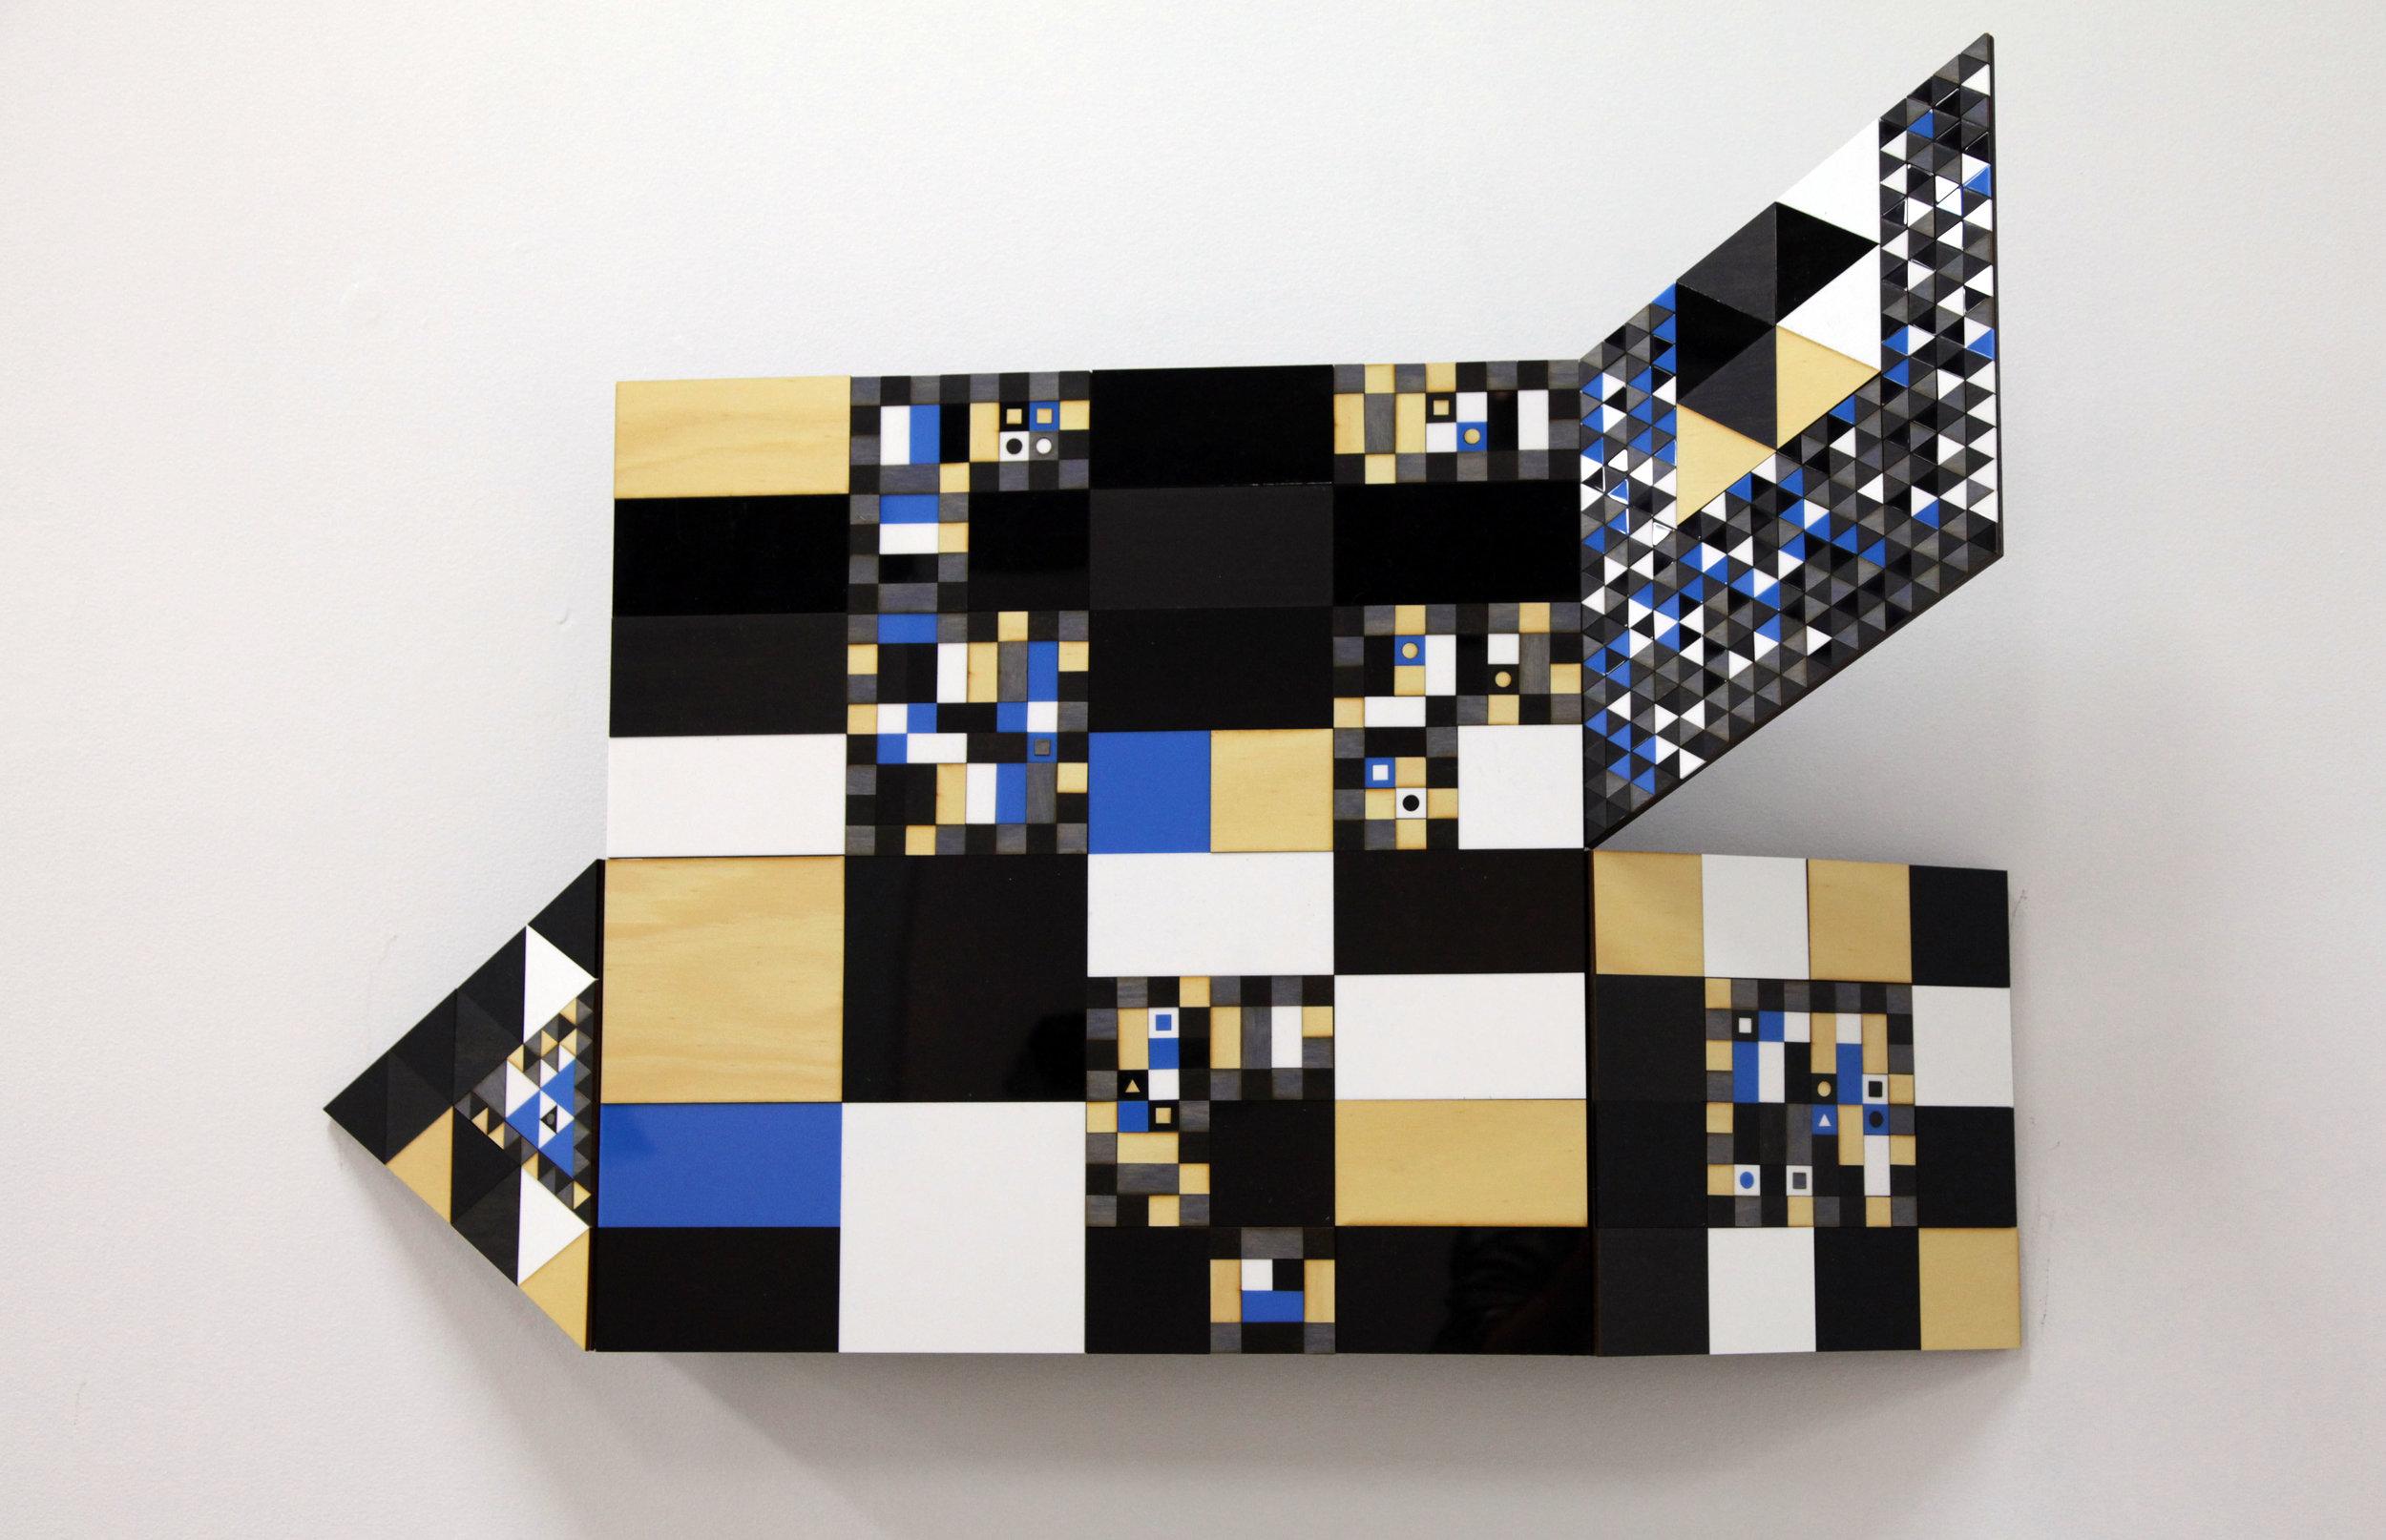 Troy Innocent, Ventifact,  2015, laser cut plywood and acrylic, 102 x 51cm